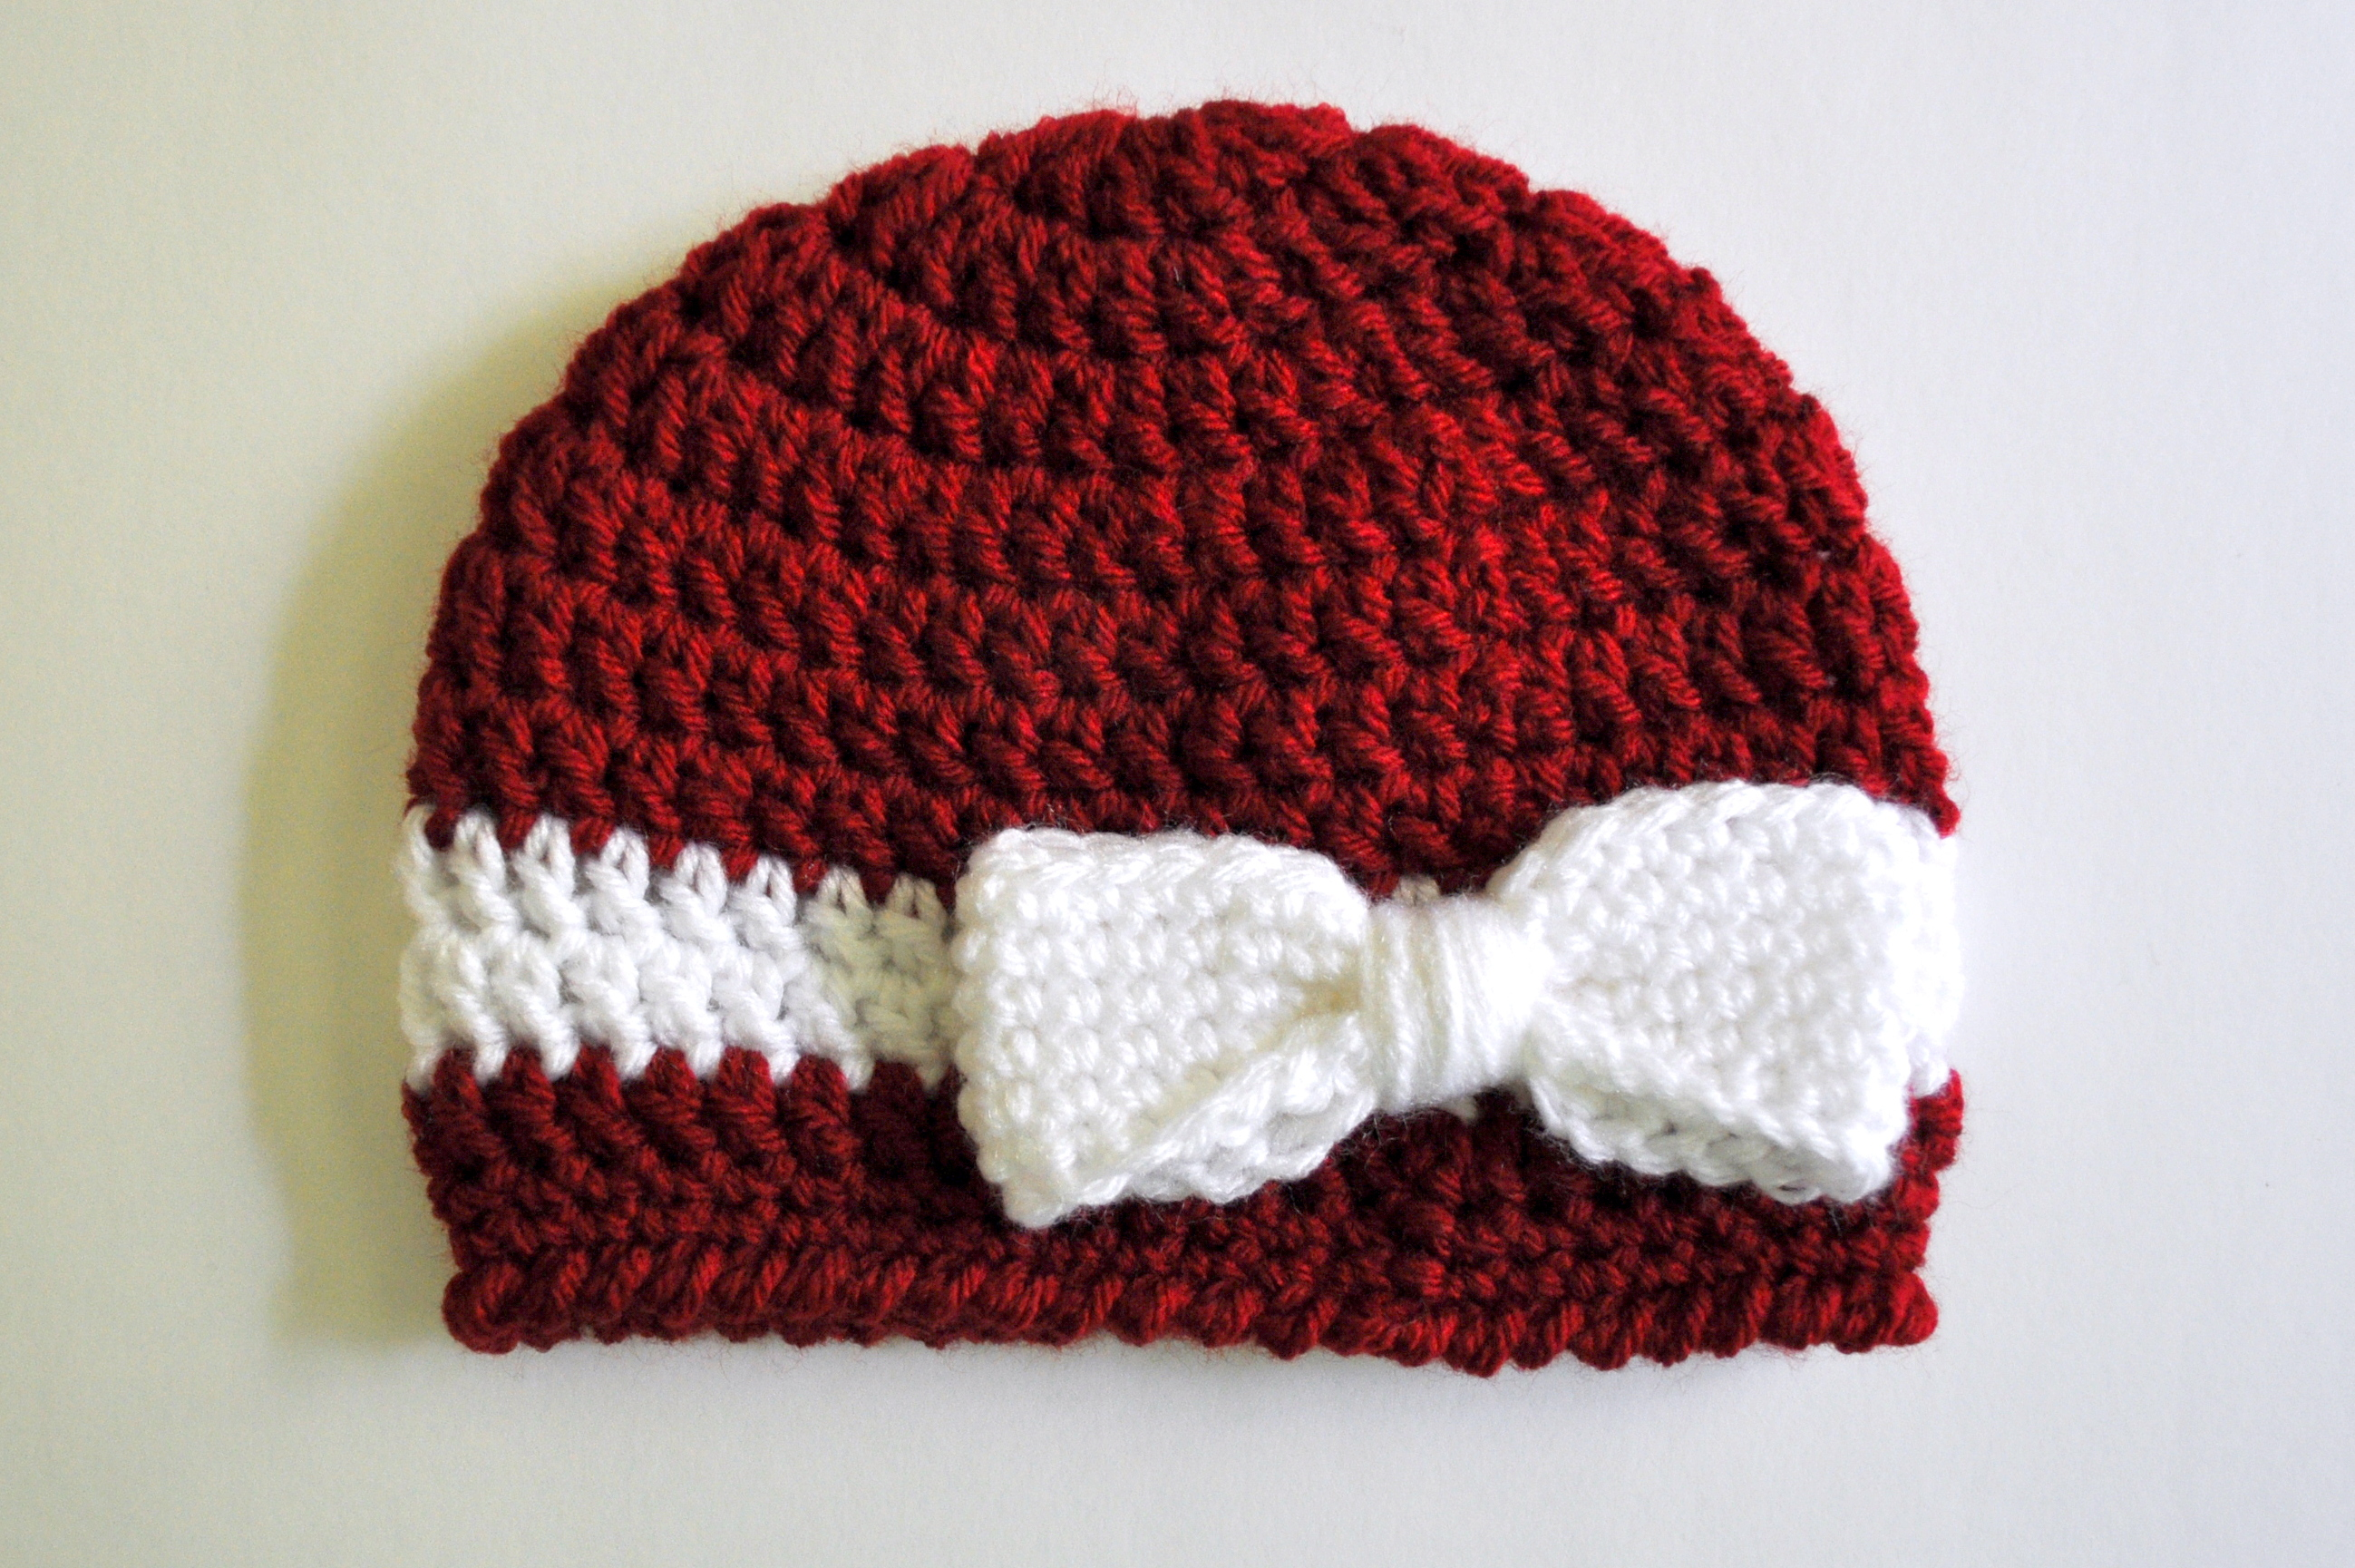 crochet baby hats crochet ribbon and bow baby hat pattern | classy crochet PFKDWNF